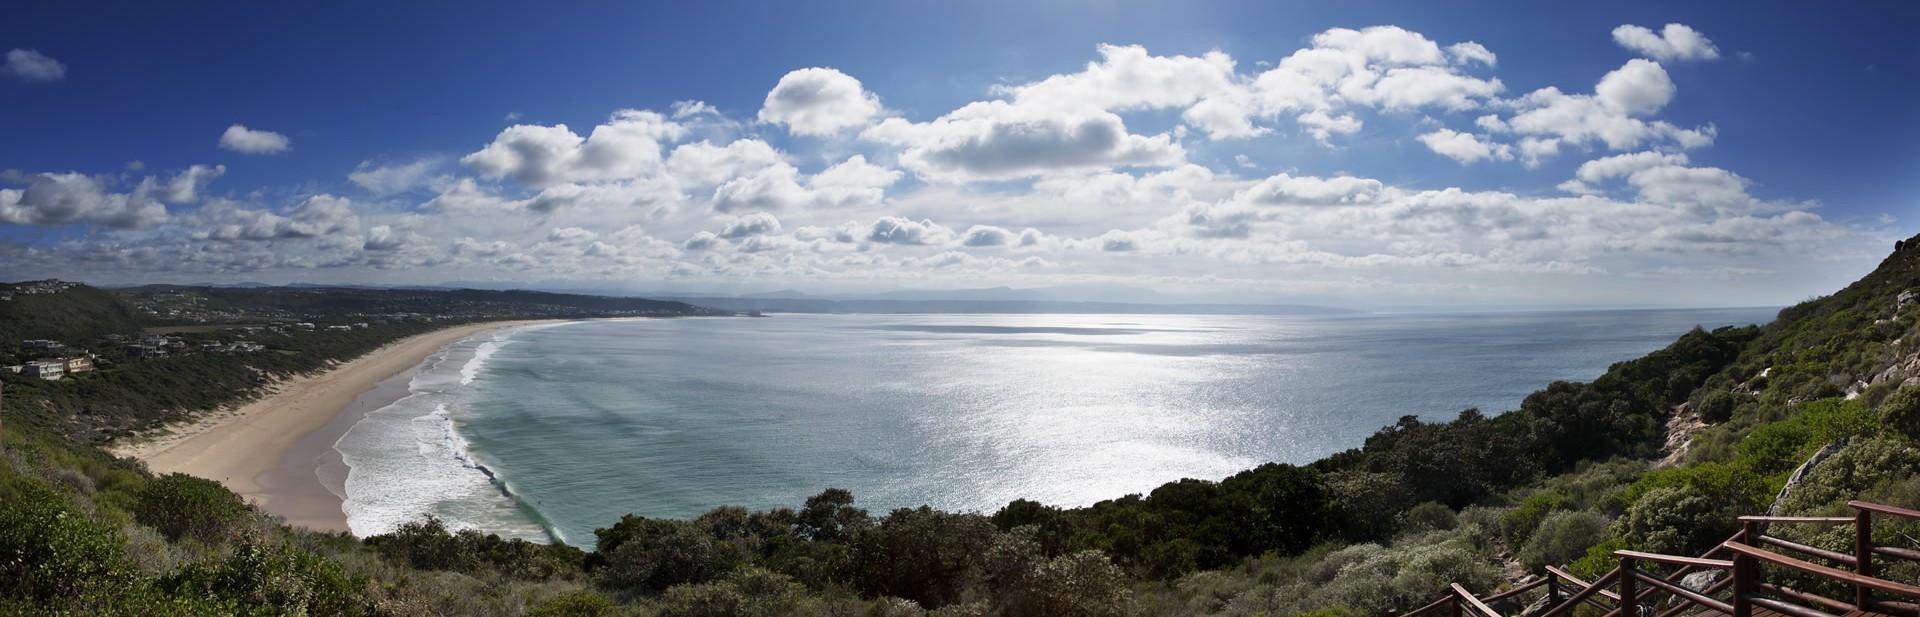 Plett view of the bay